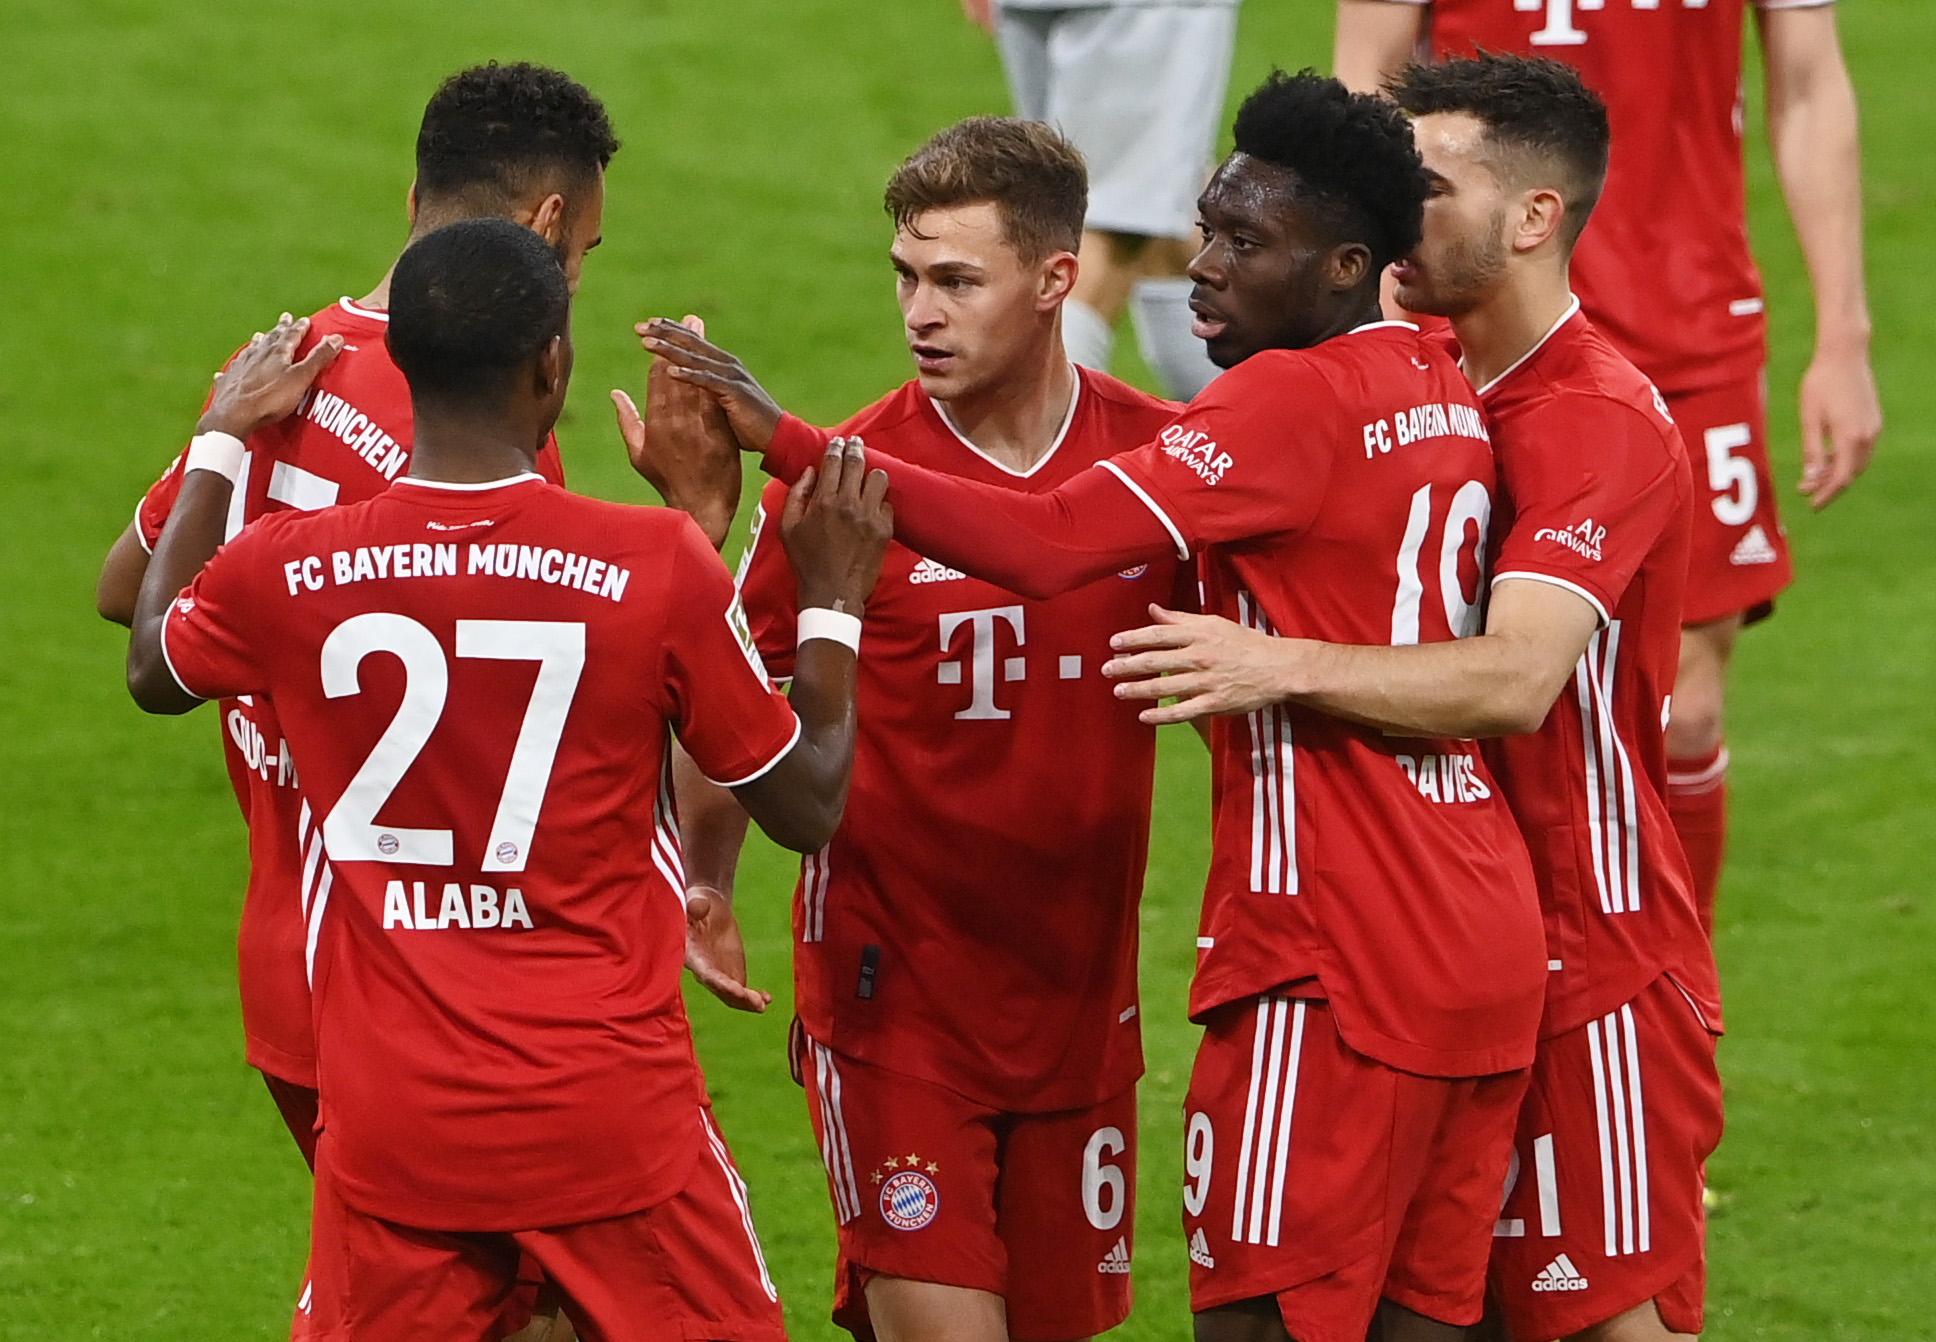 Kimmich (No. 6) berbagi kegembiraan dengan rekan setimnya di Bayern.  Foto: Reuters.